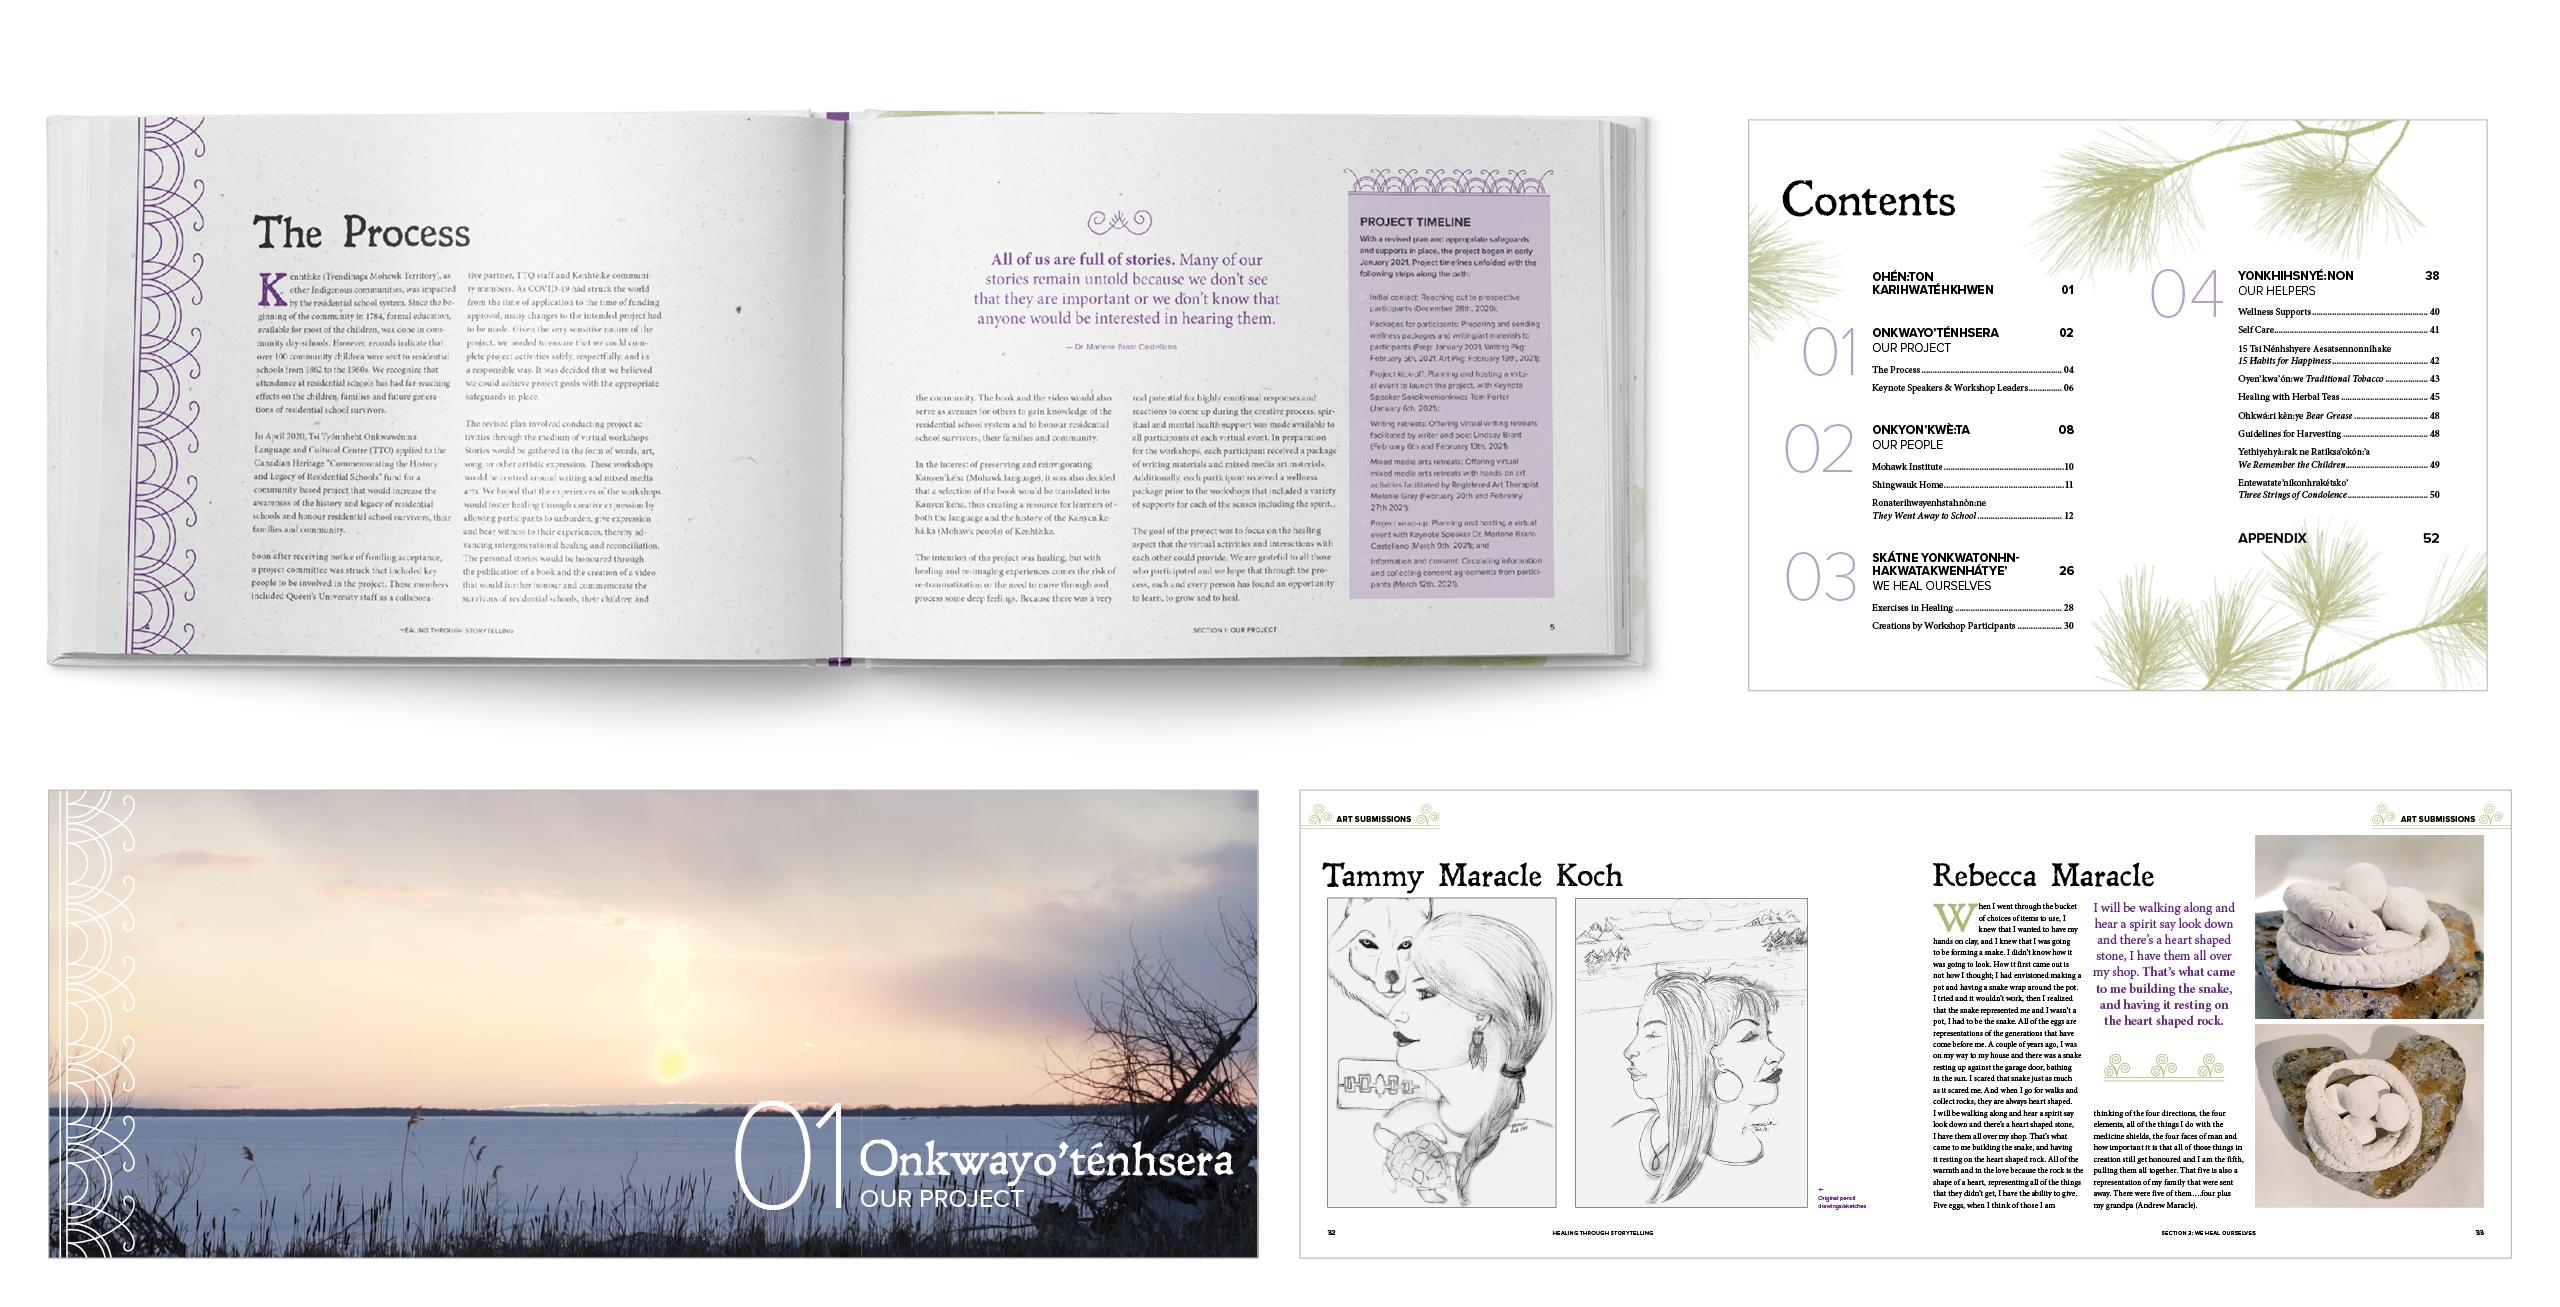 tsi tyonnheht onkwawen na healing through storytelling hardcover book design residential schools